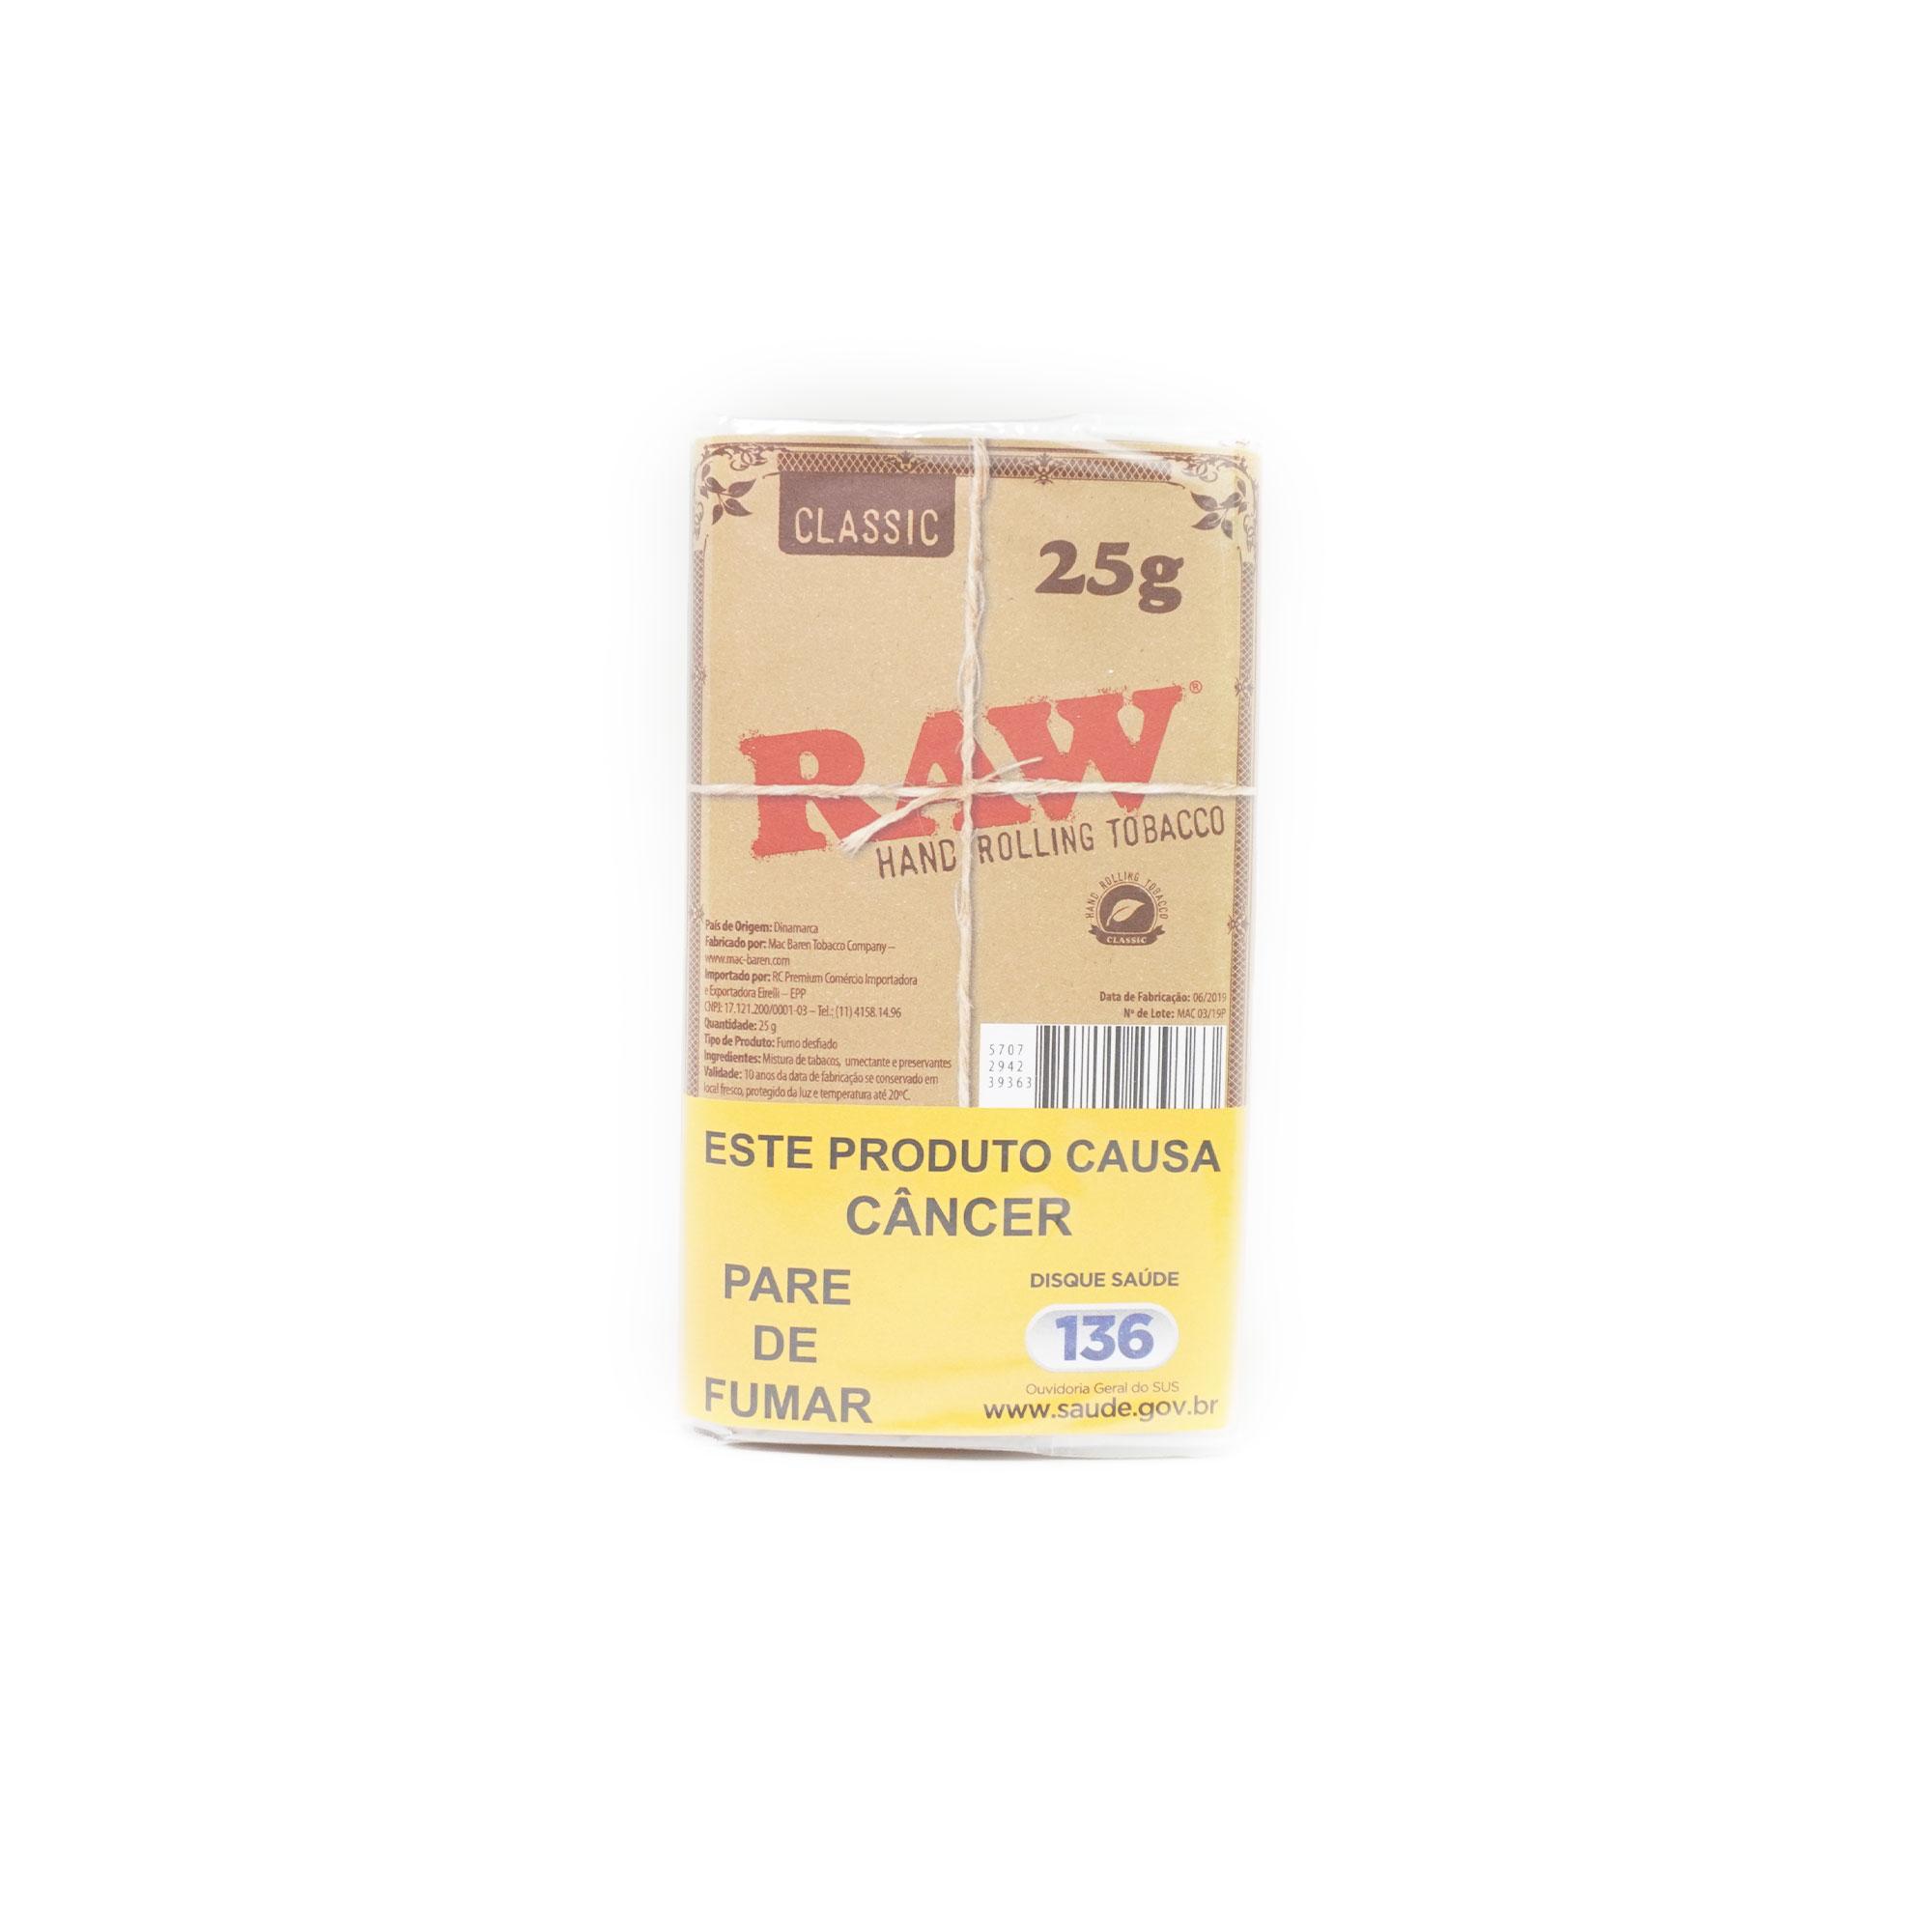 Tabaco Raw Classic 25g